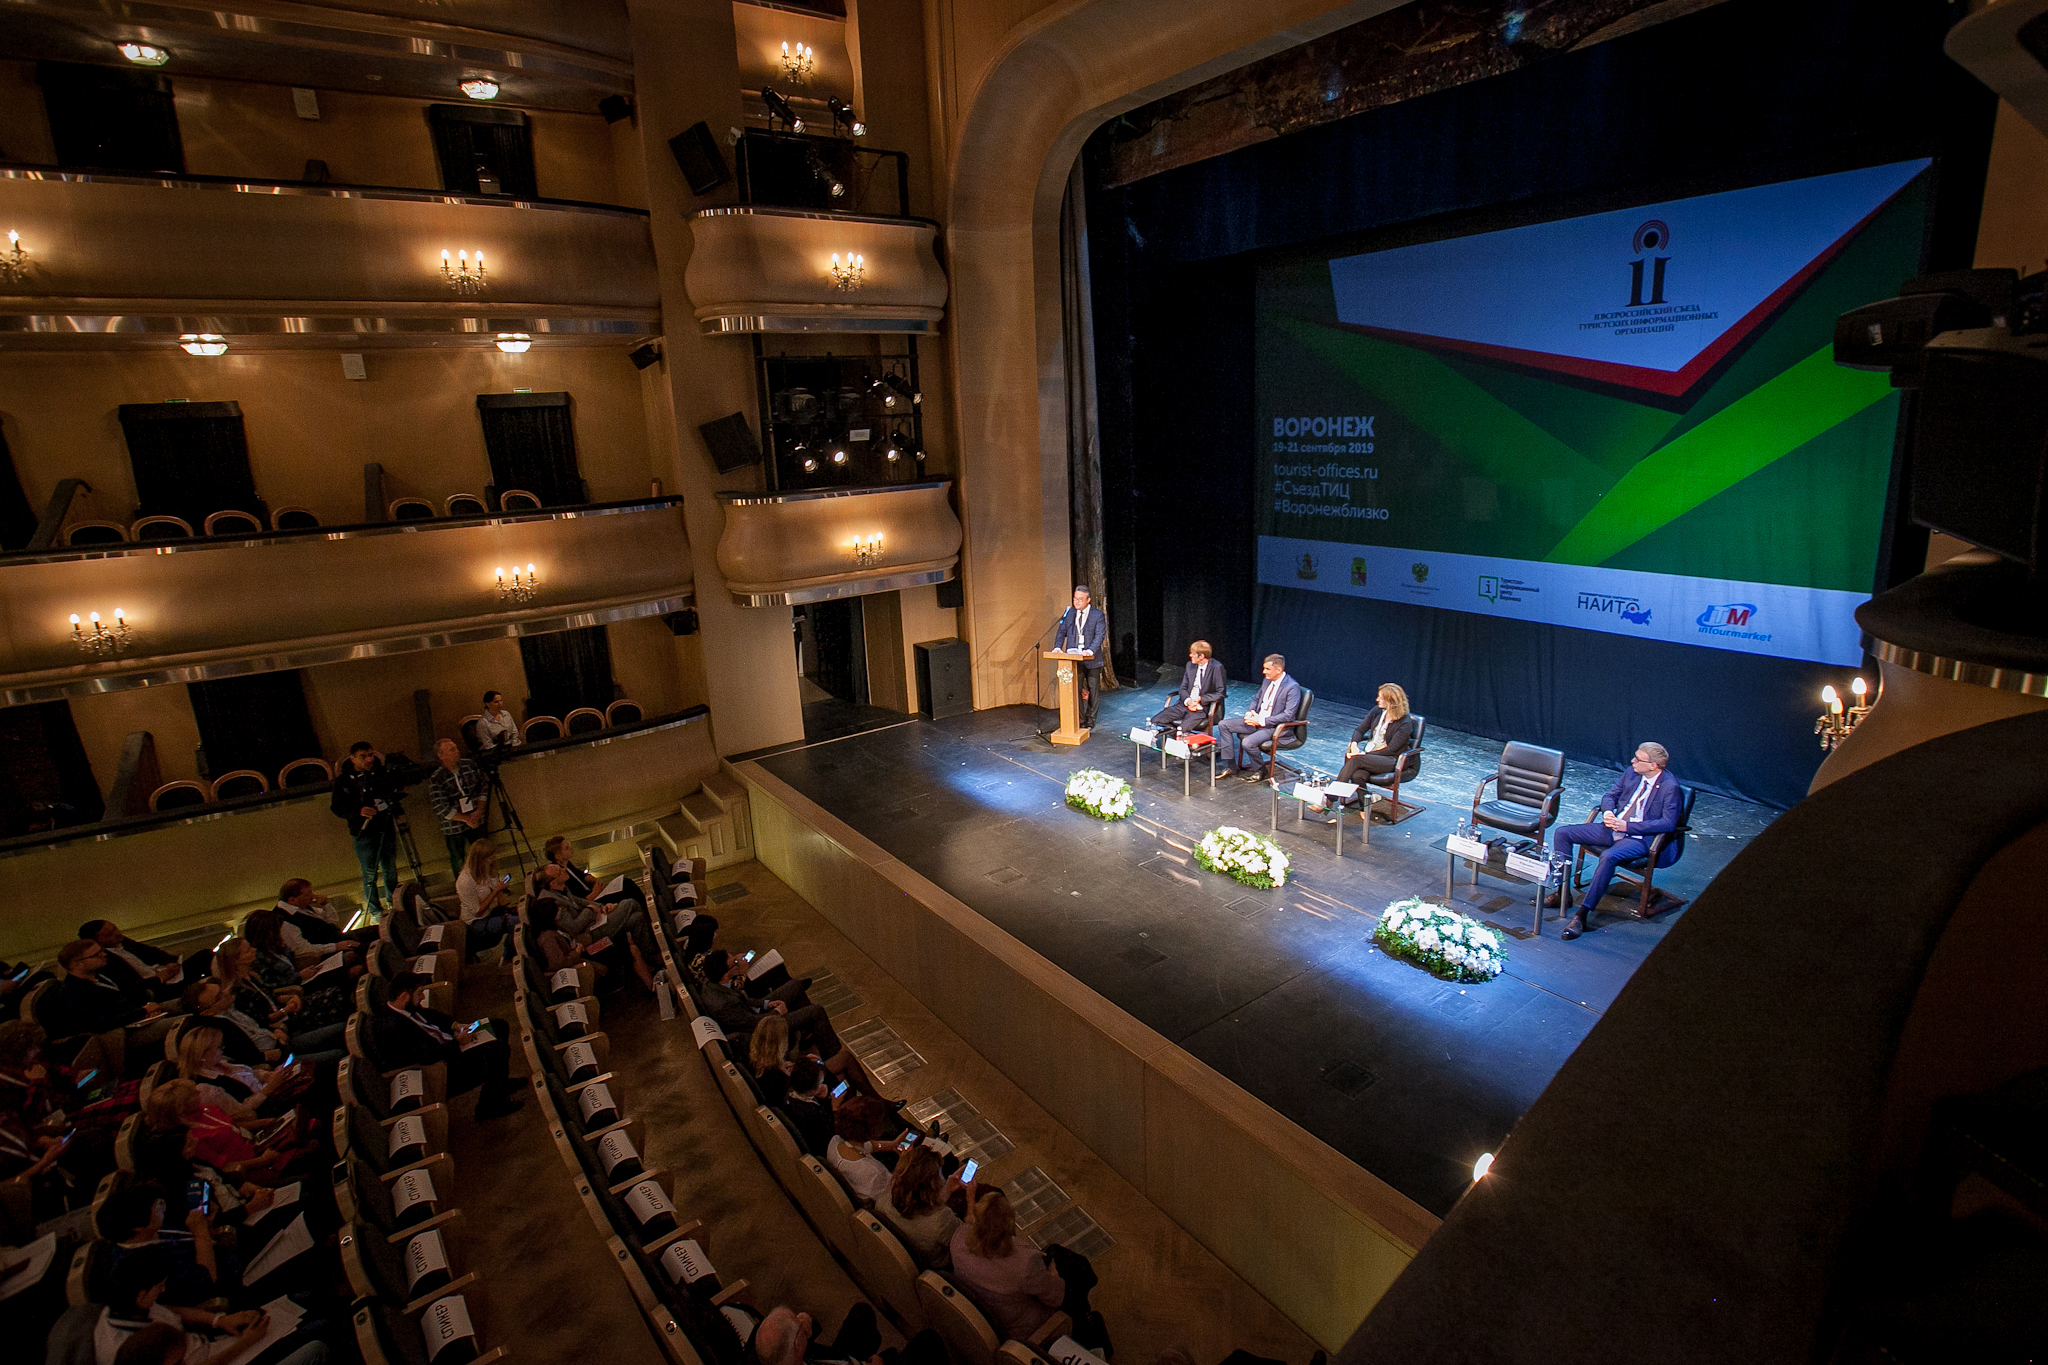 II Всероссийский съезд ТИЦ состоялся в Воронеже